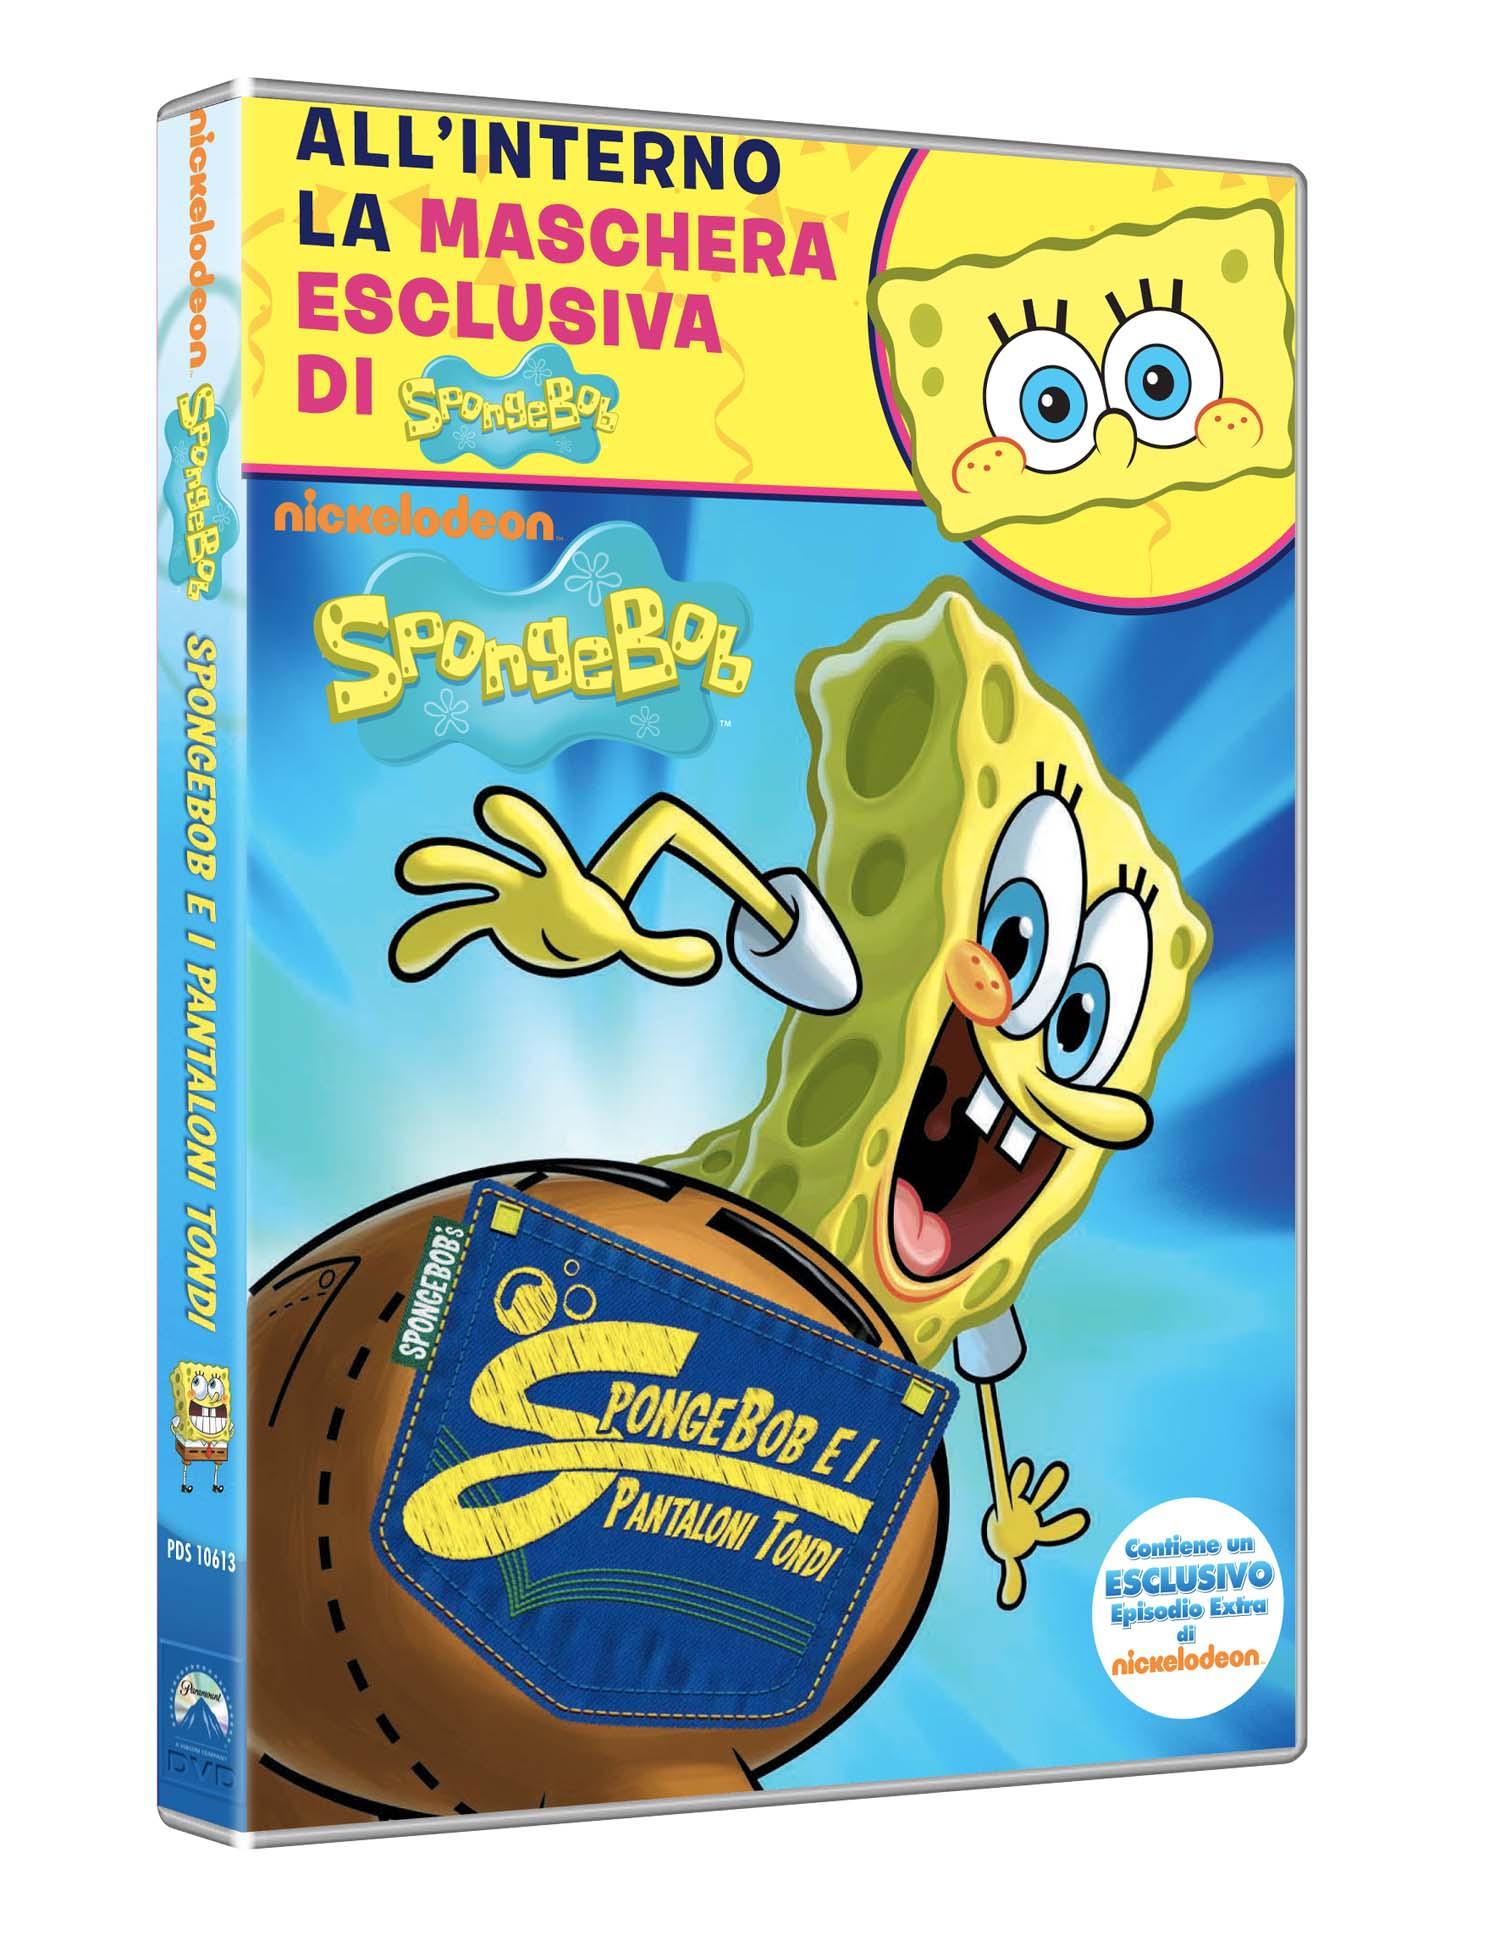 SPONGEBOB - I PANTALONI TONDI (DVD+MASCHERA) (CARNEVALE COLLECTI